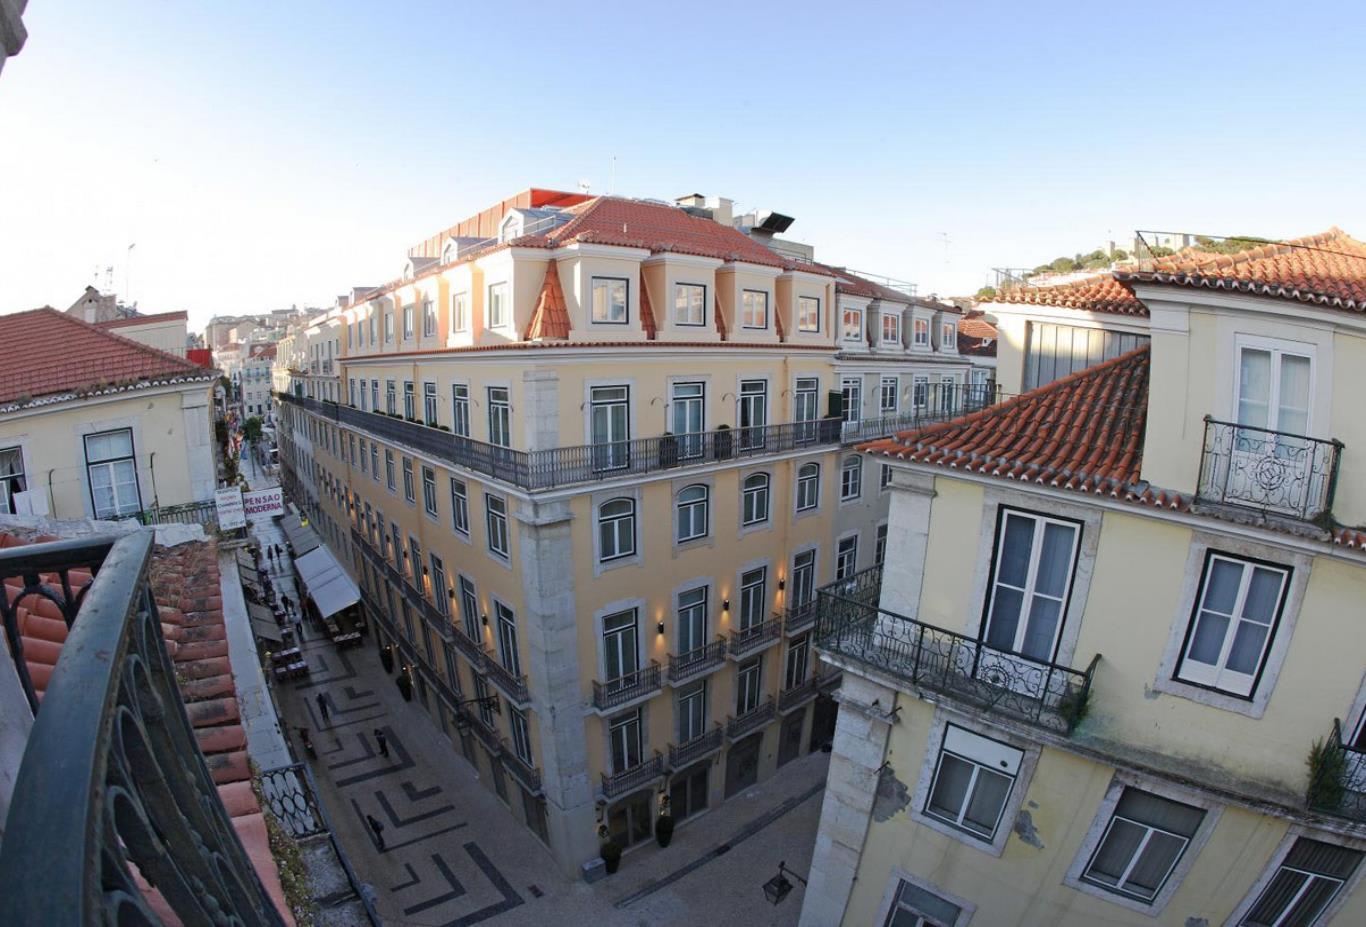 Exterior-high-view